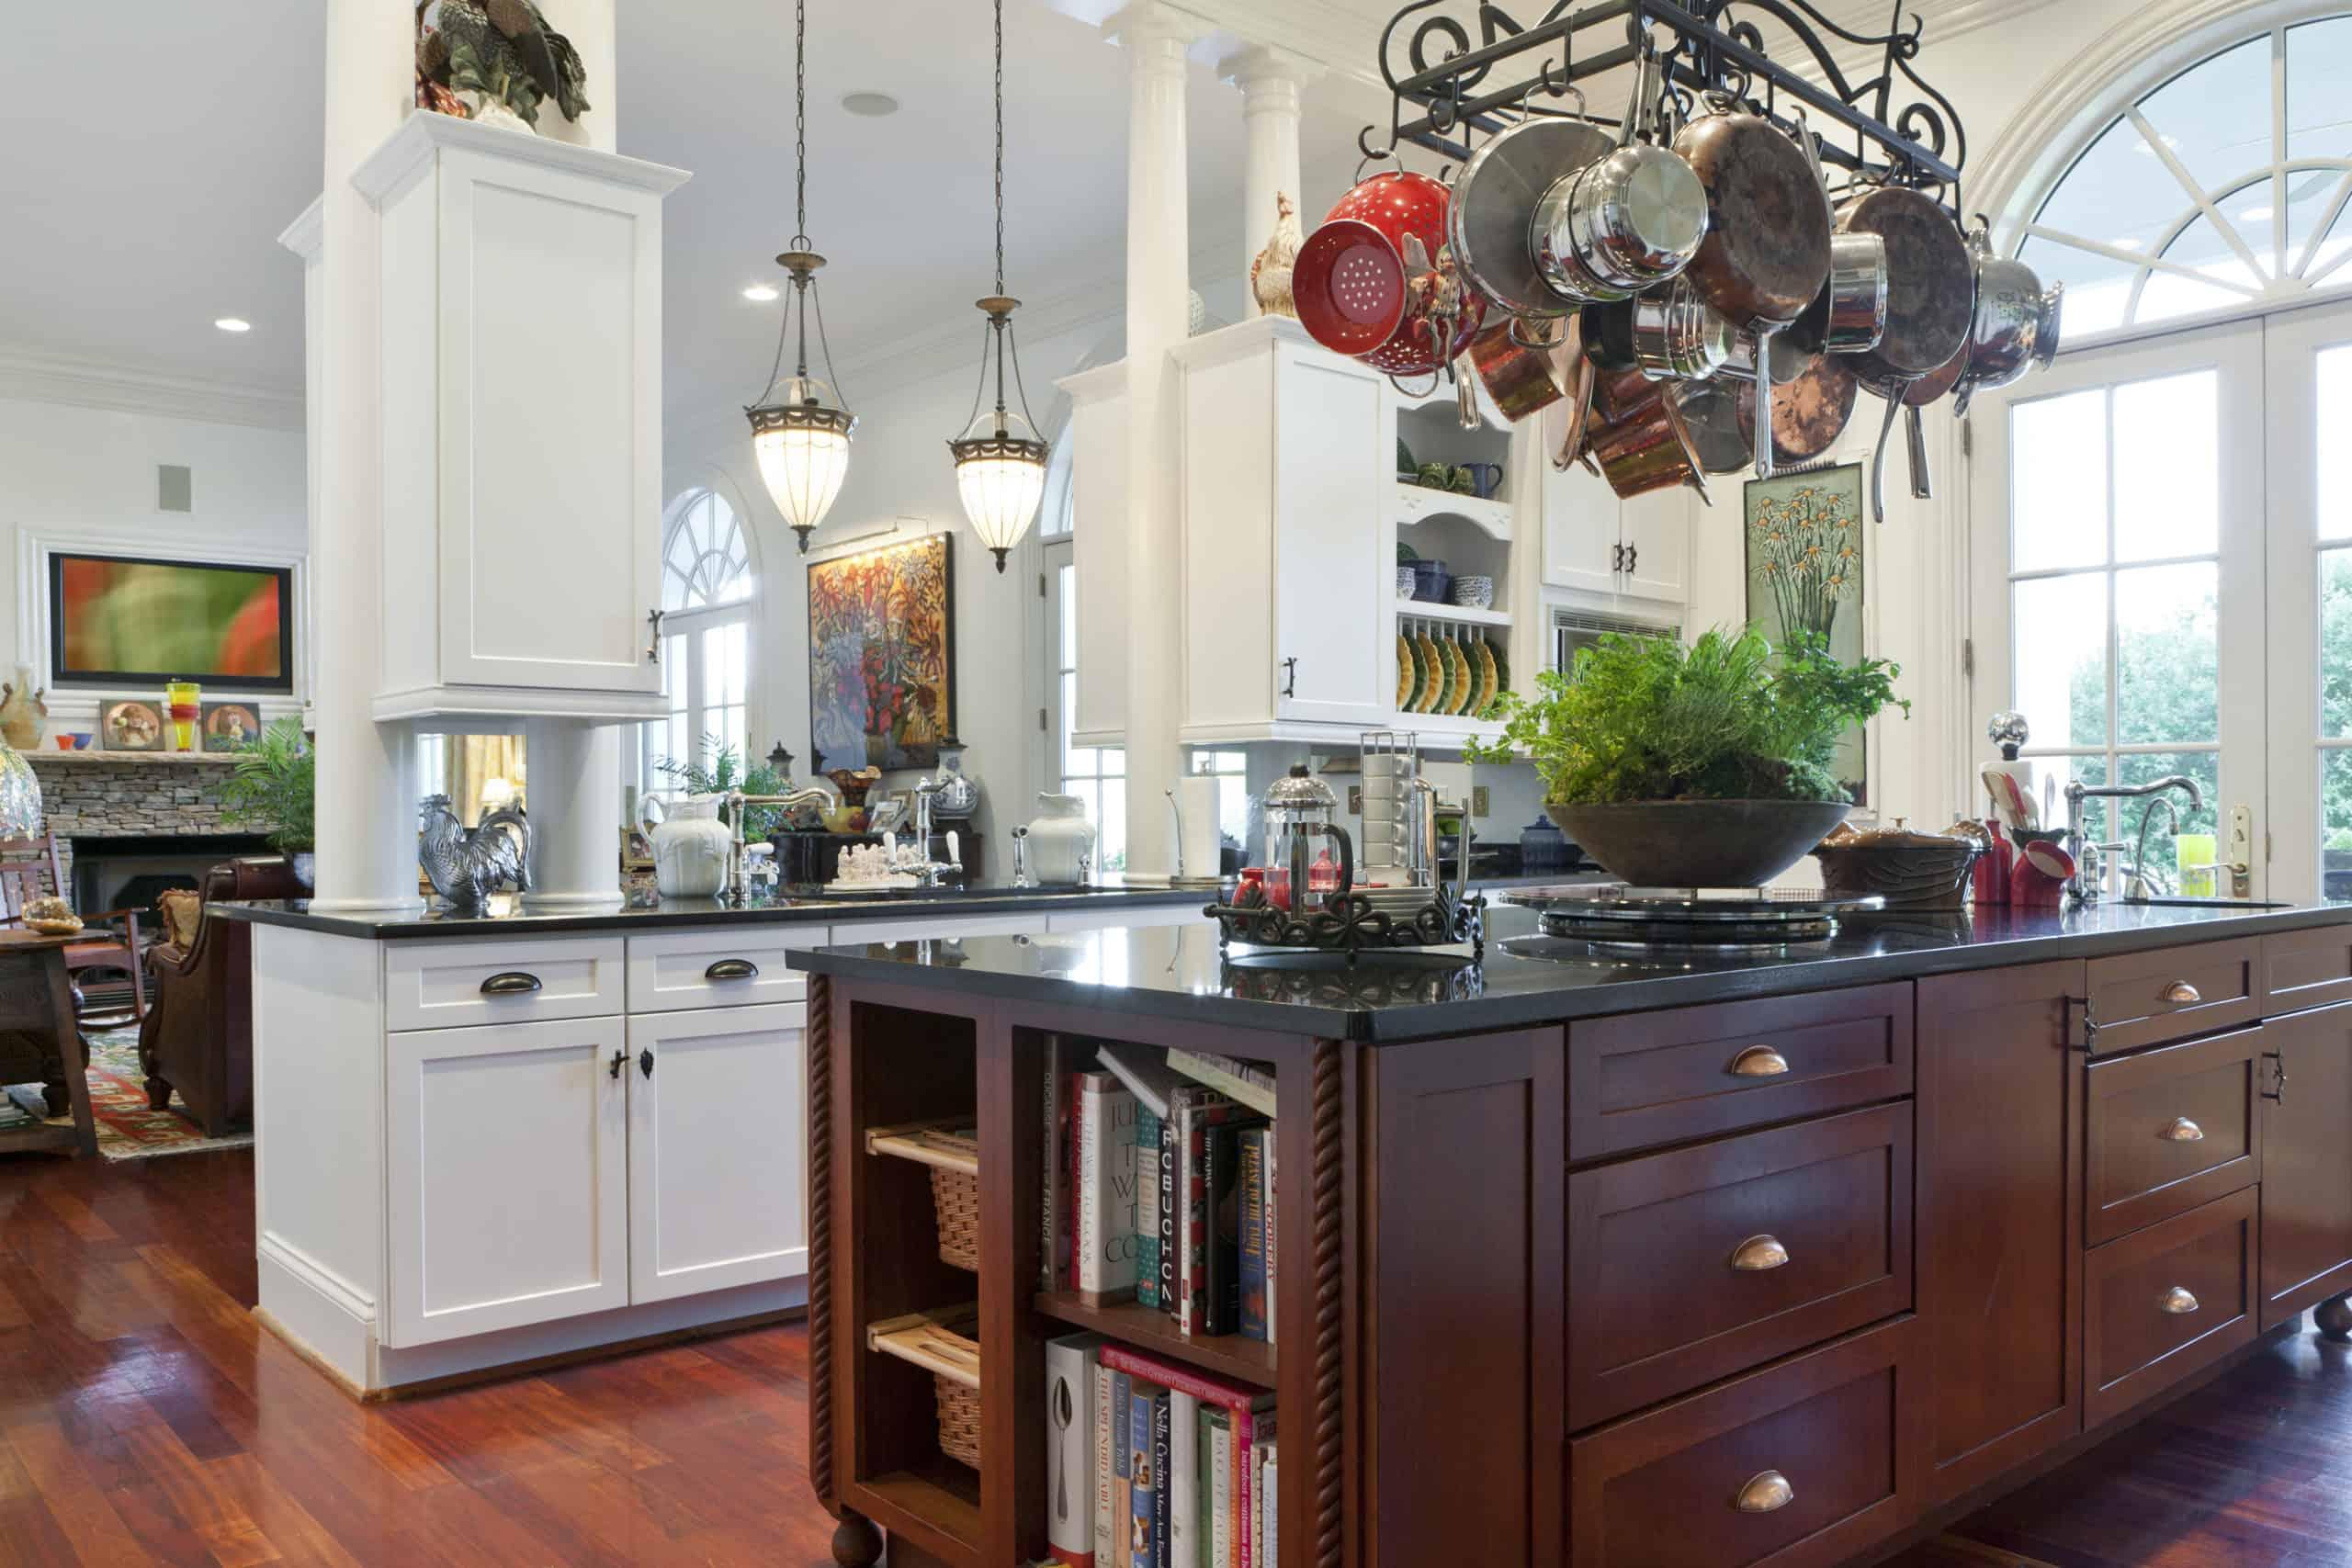 022horiz-kitchen-and-family